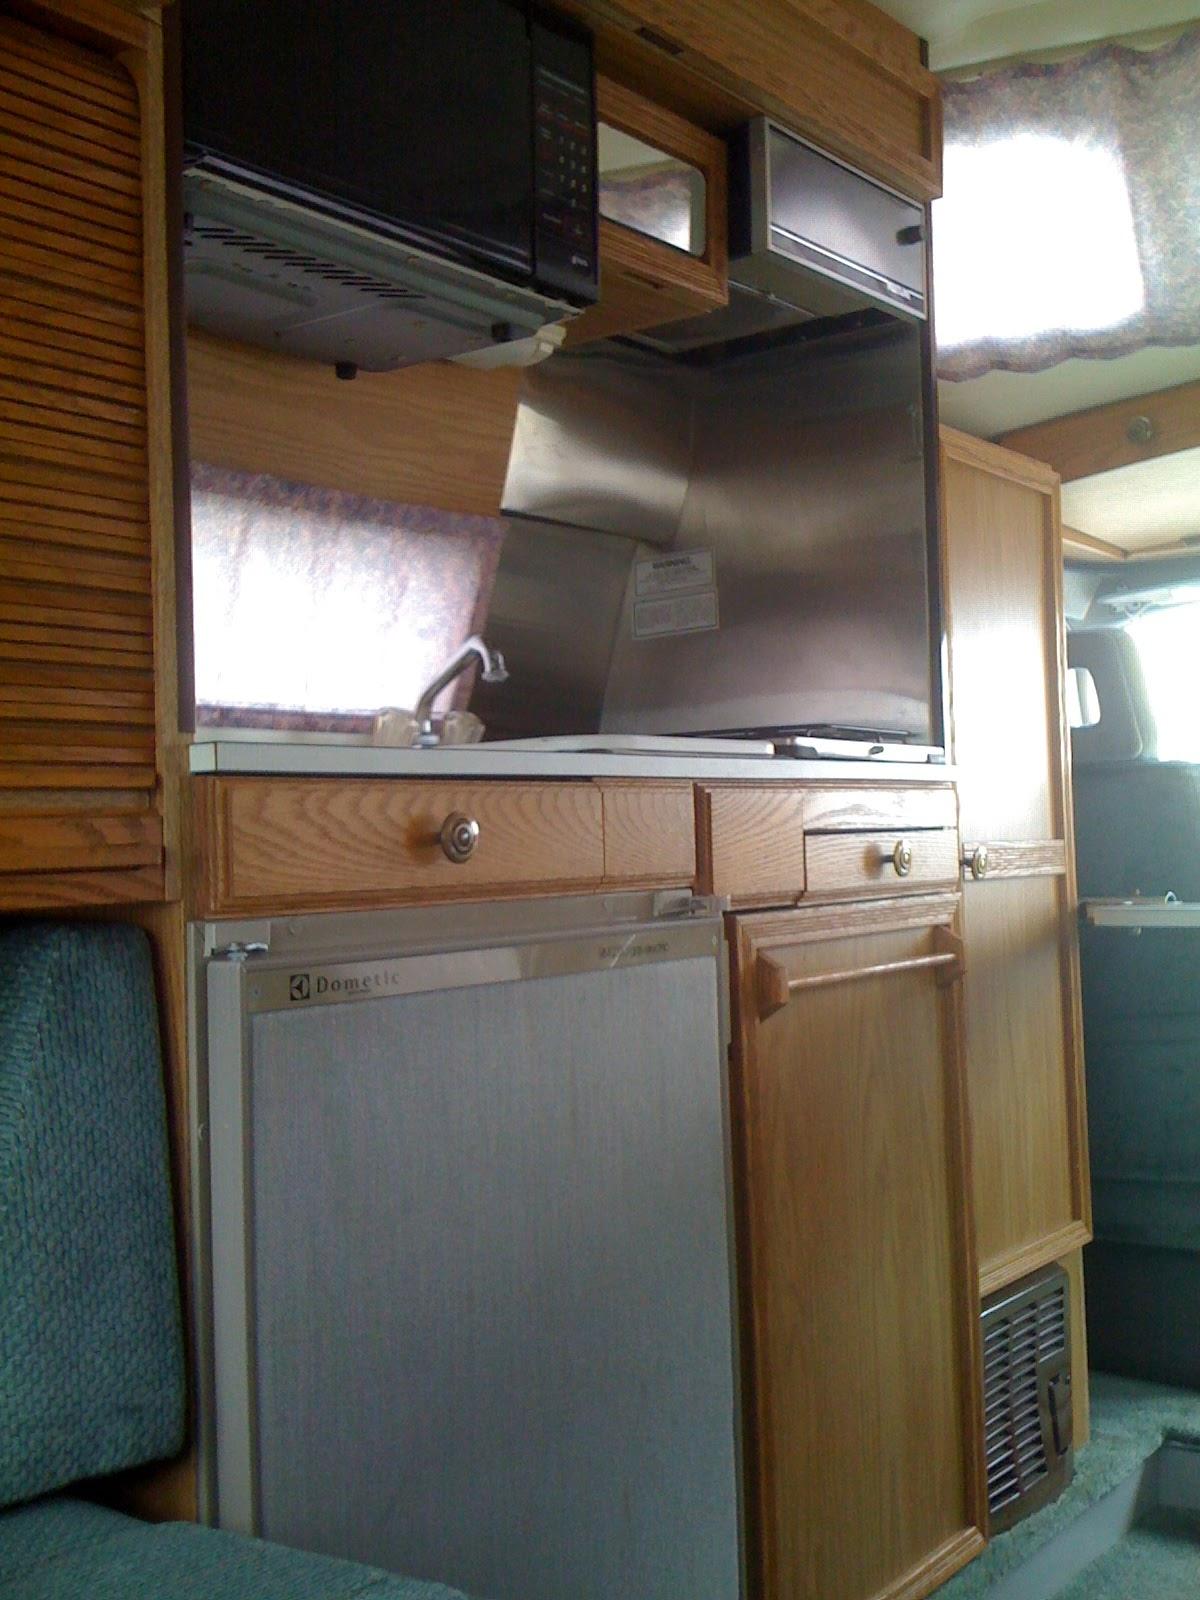 Myroadtrek4sale Awesome Conversion Camper Van Roadtrek 170 Class B Type Rv Fully Self Contained